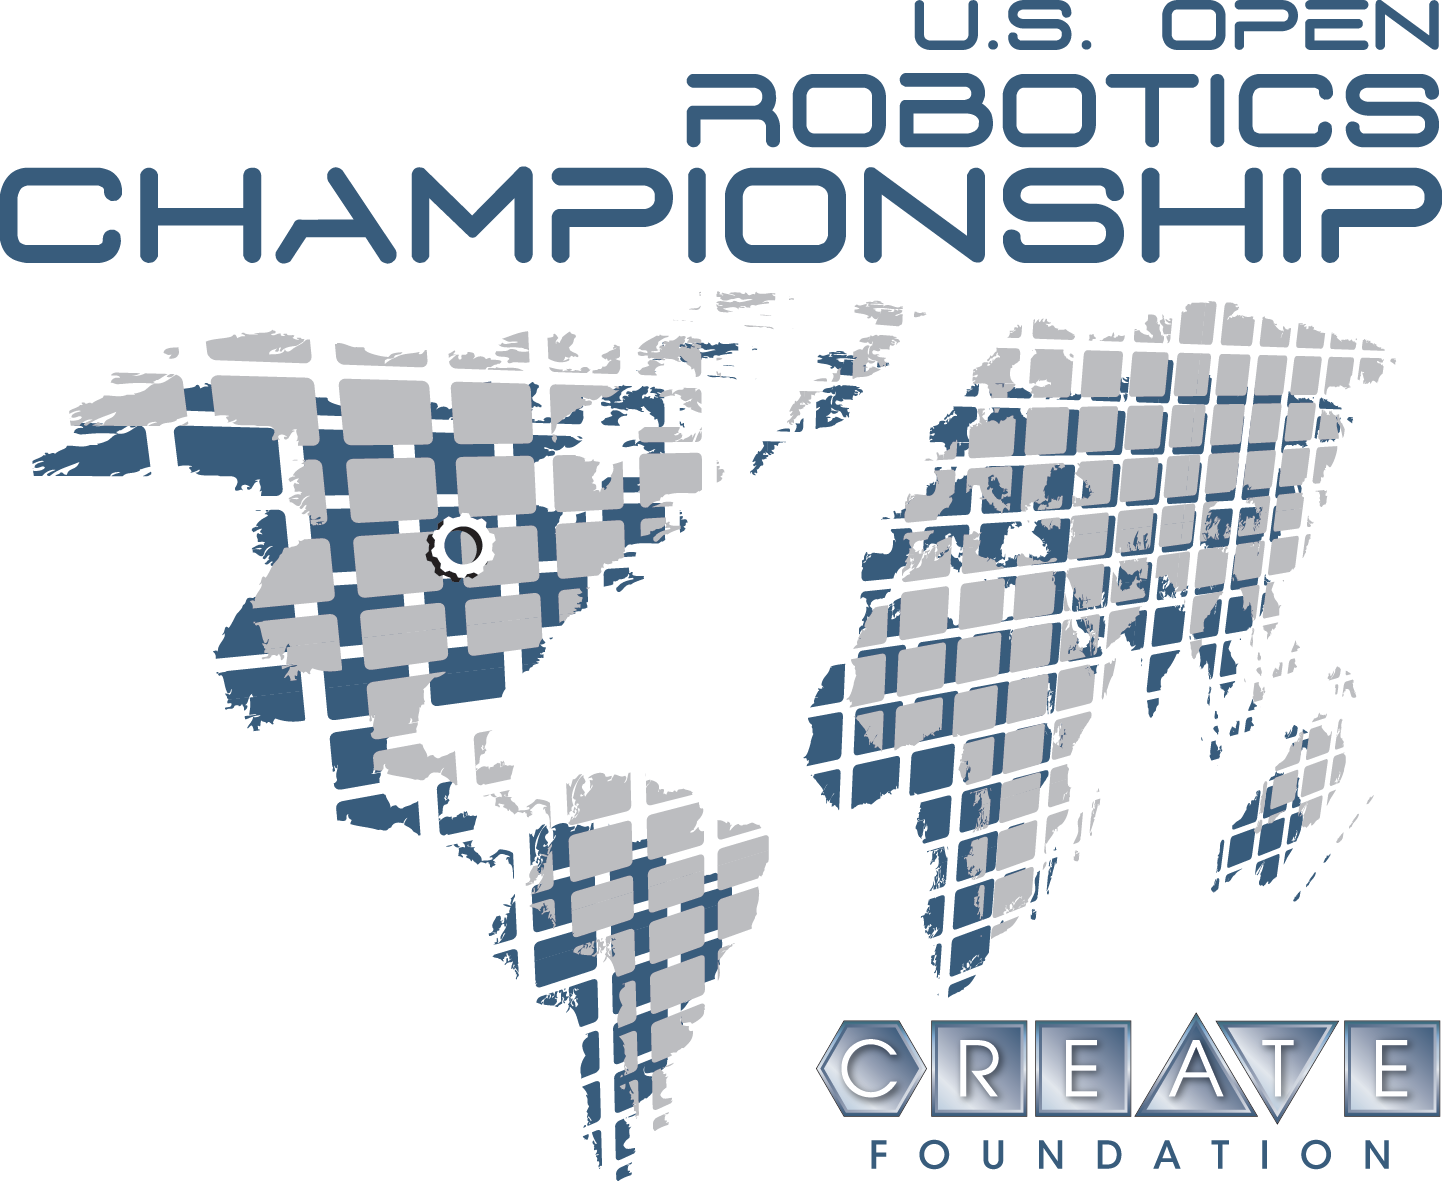 2020 CREATE U.S. Open Robotics Championship - VEX IQ - MIDDLE SCHOOL DIVISION